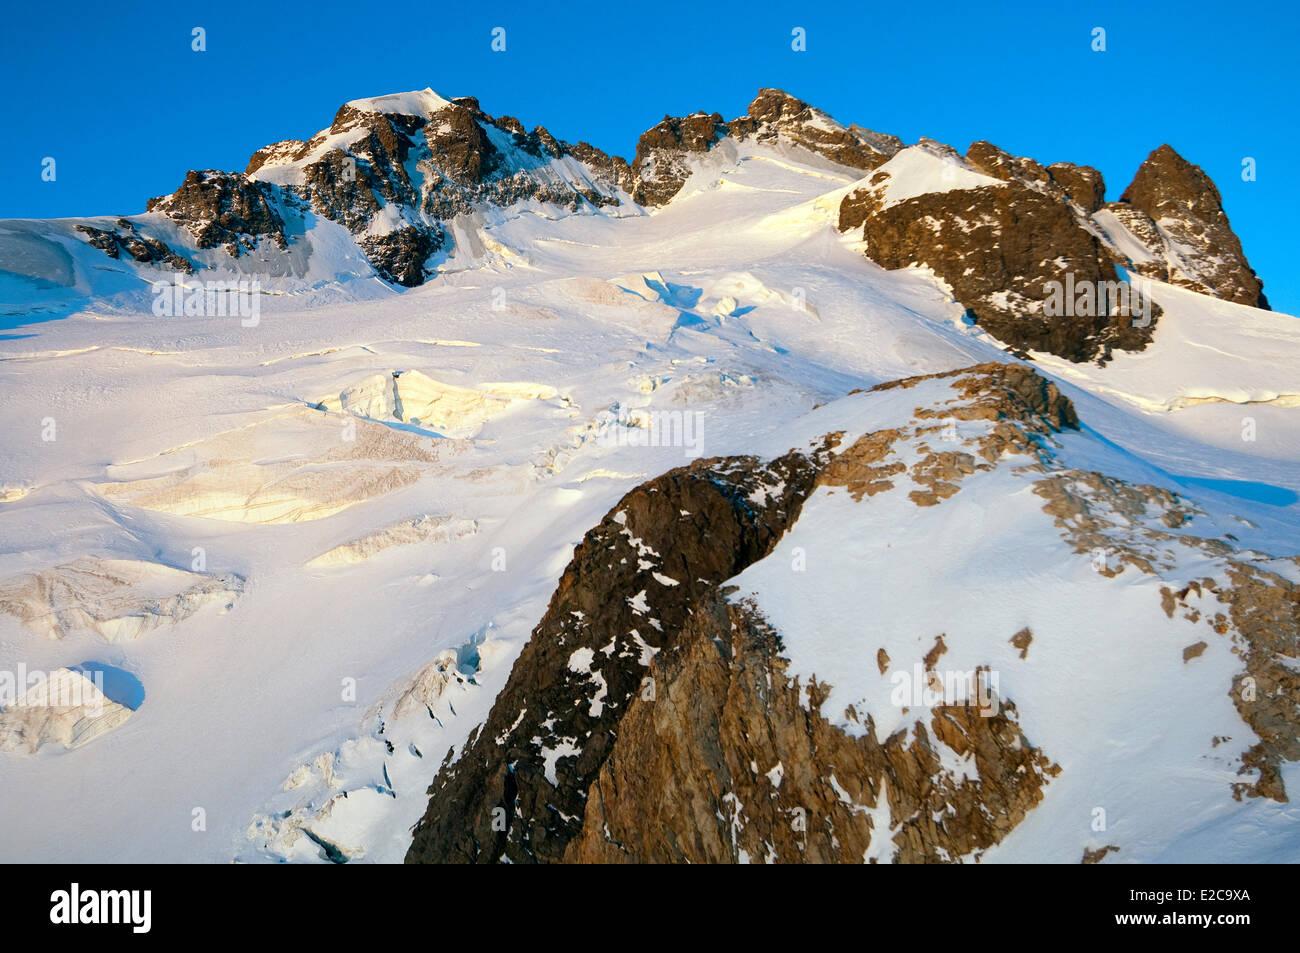 France, Hautes Alpes, Tour de la Meije by touring ski, panorama on the Meije, (3983 m), from the Refuge de l'Aigle - Stock Image